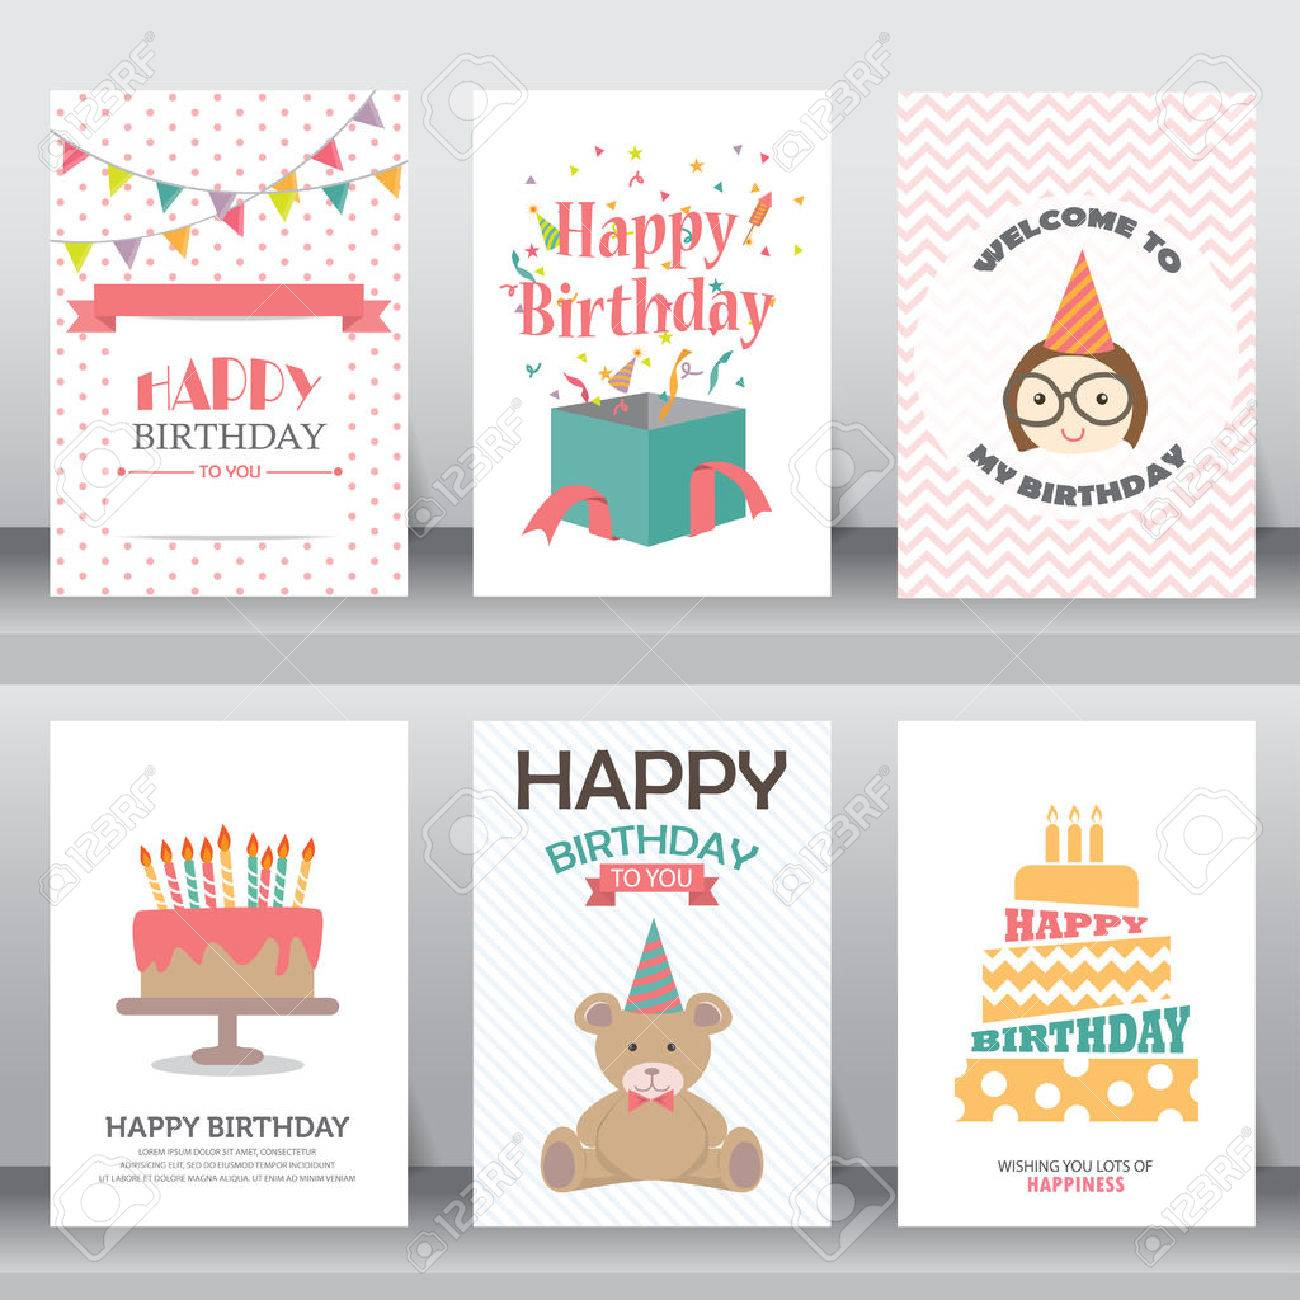 happy birthday, holiday, christmas greeting and invitation card. - 53611332